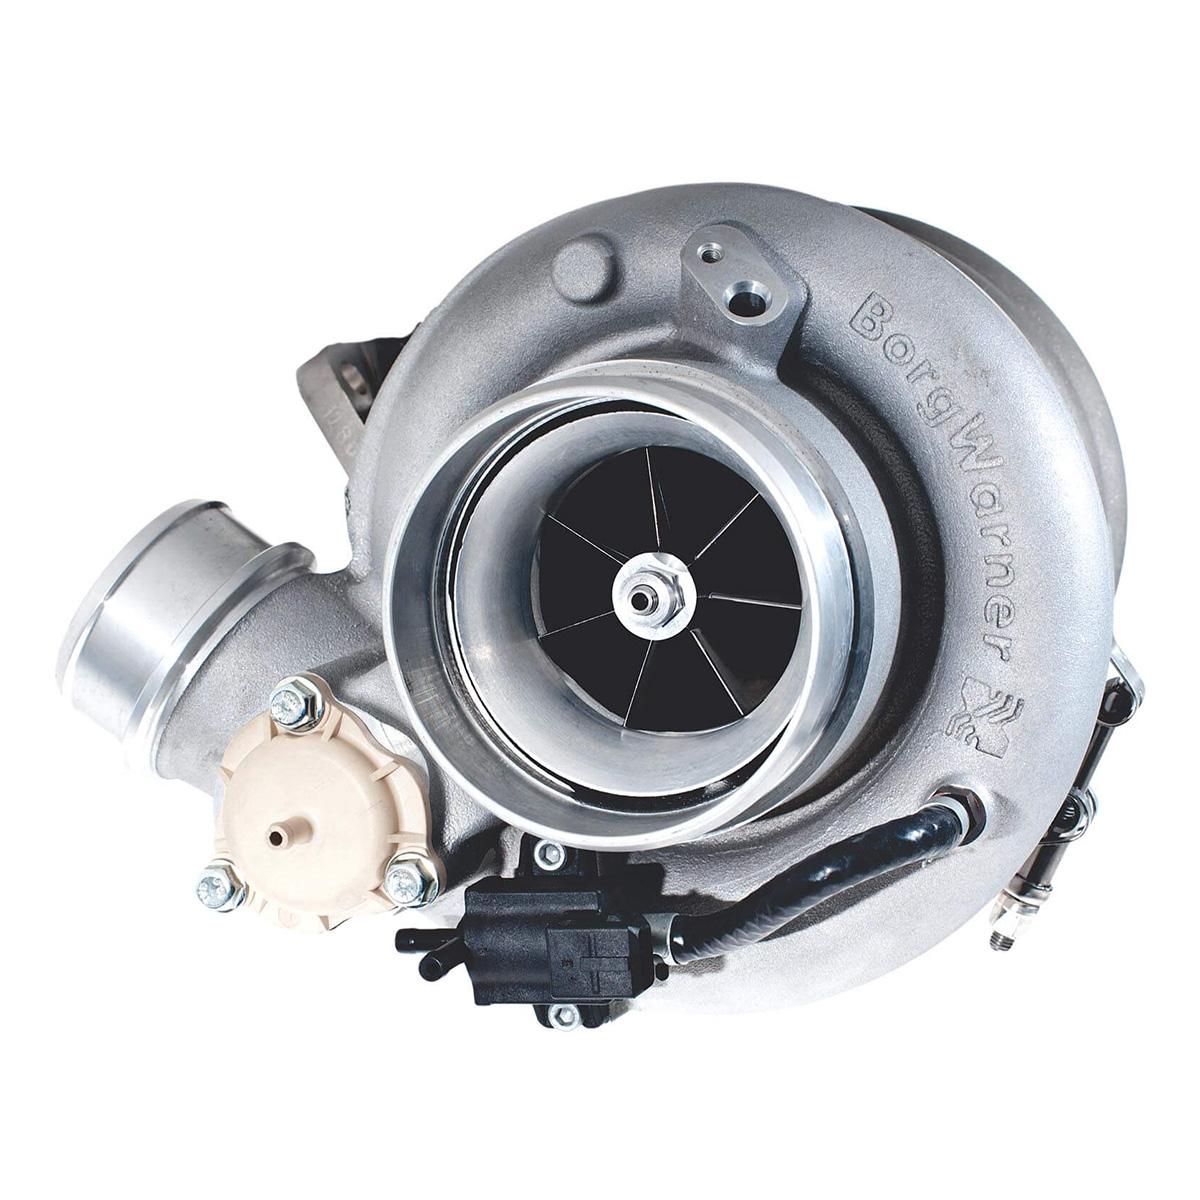 Shop Turbo Specific: BorgWarner EFR 8474 Turbocharger